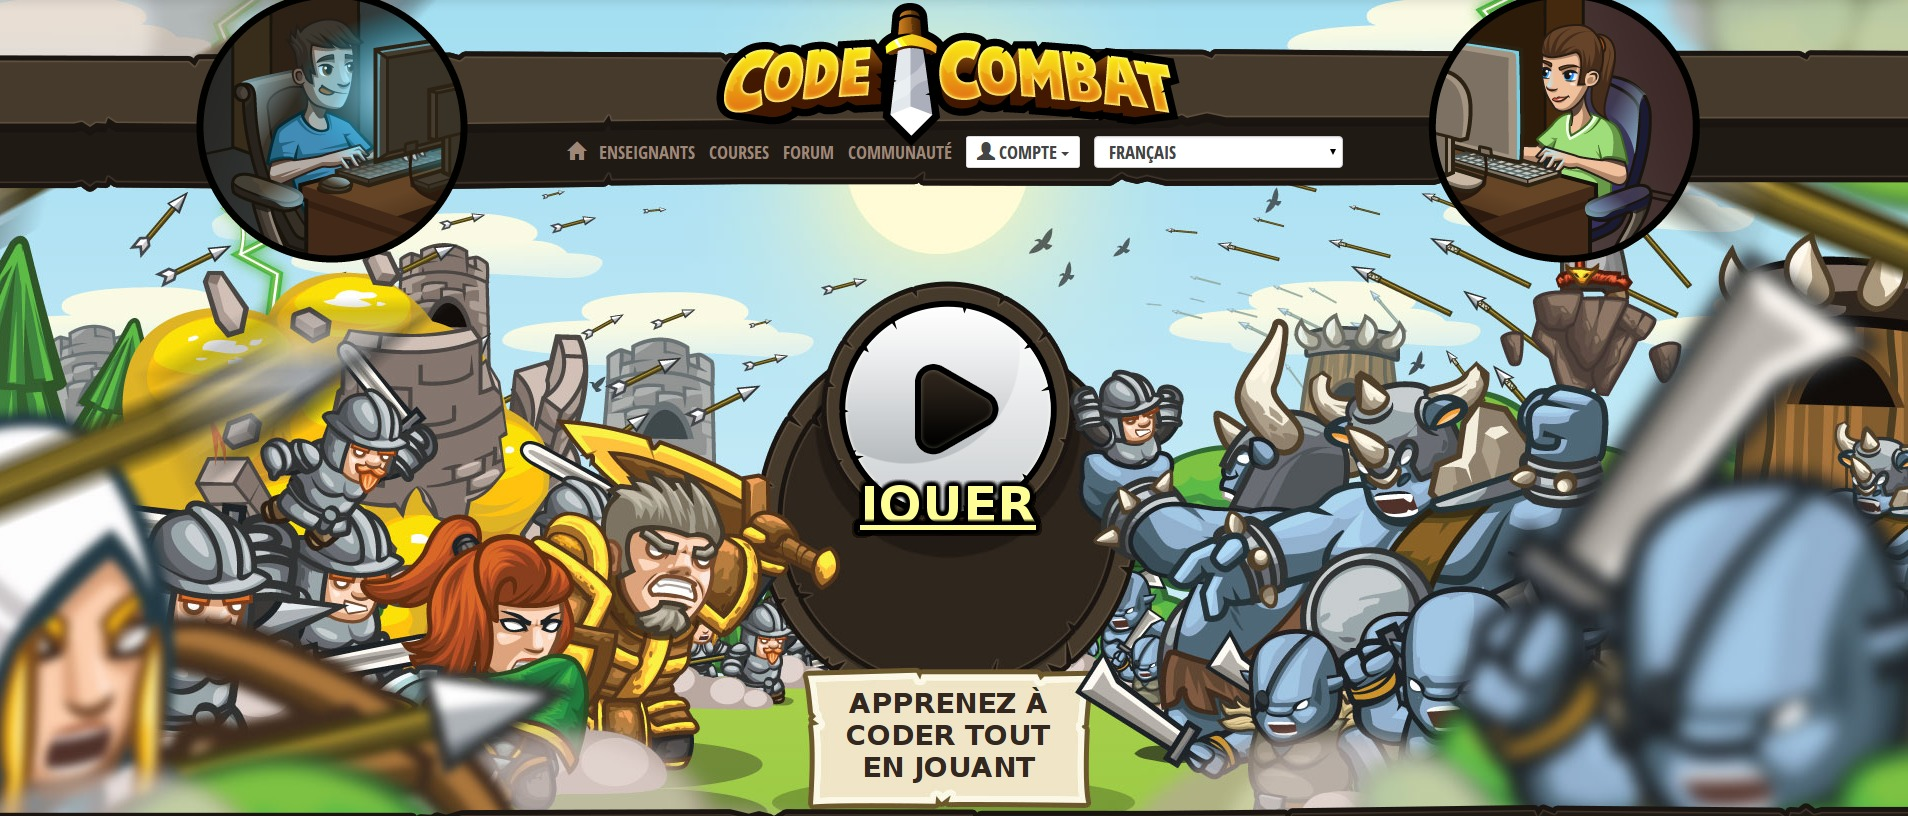 codecombat-home